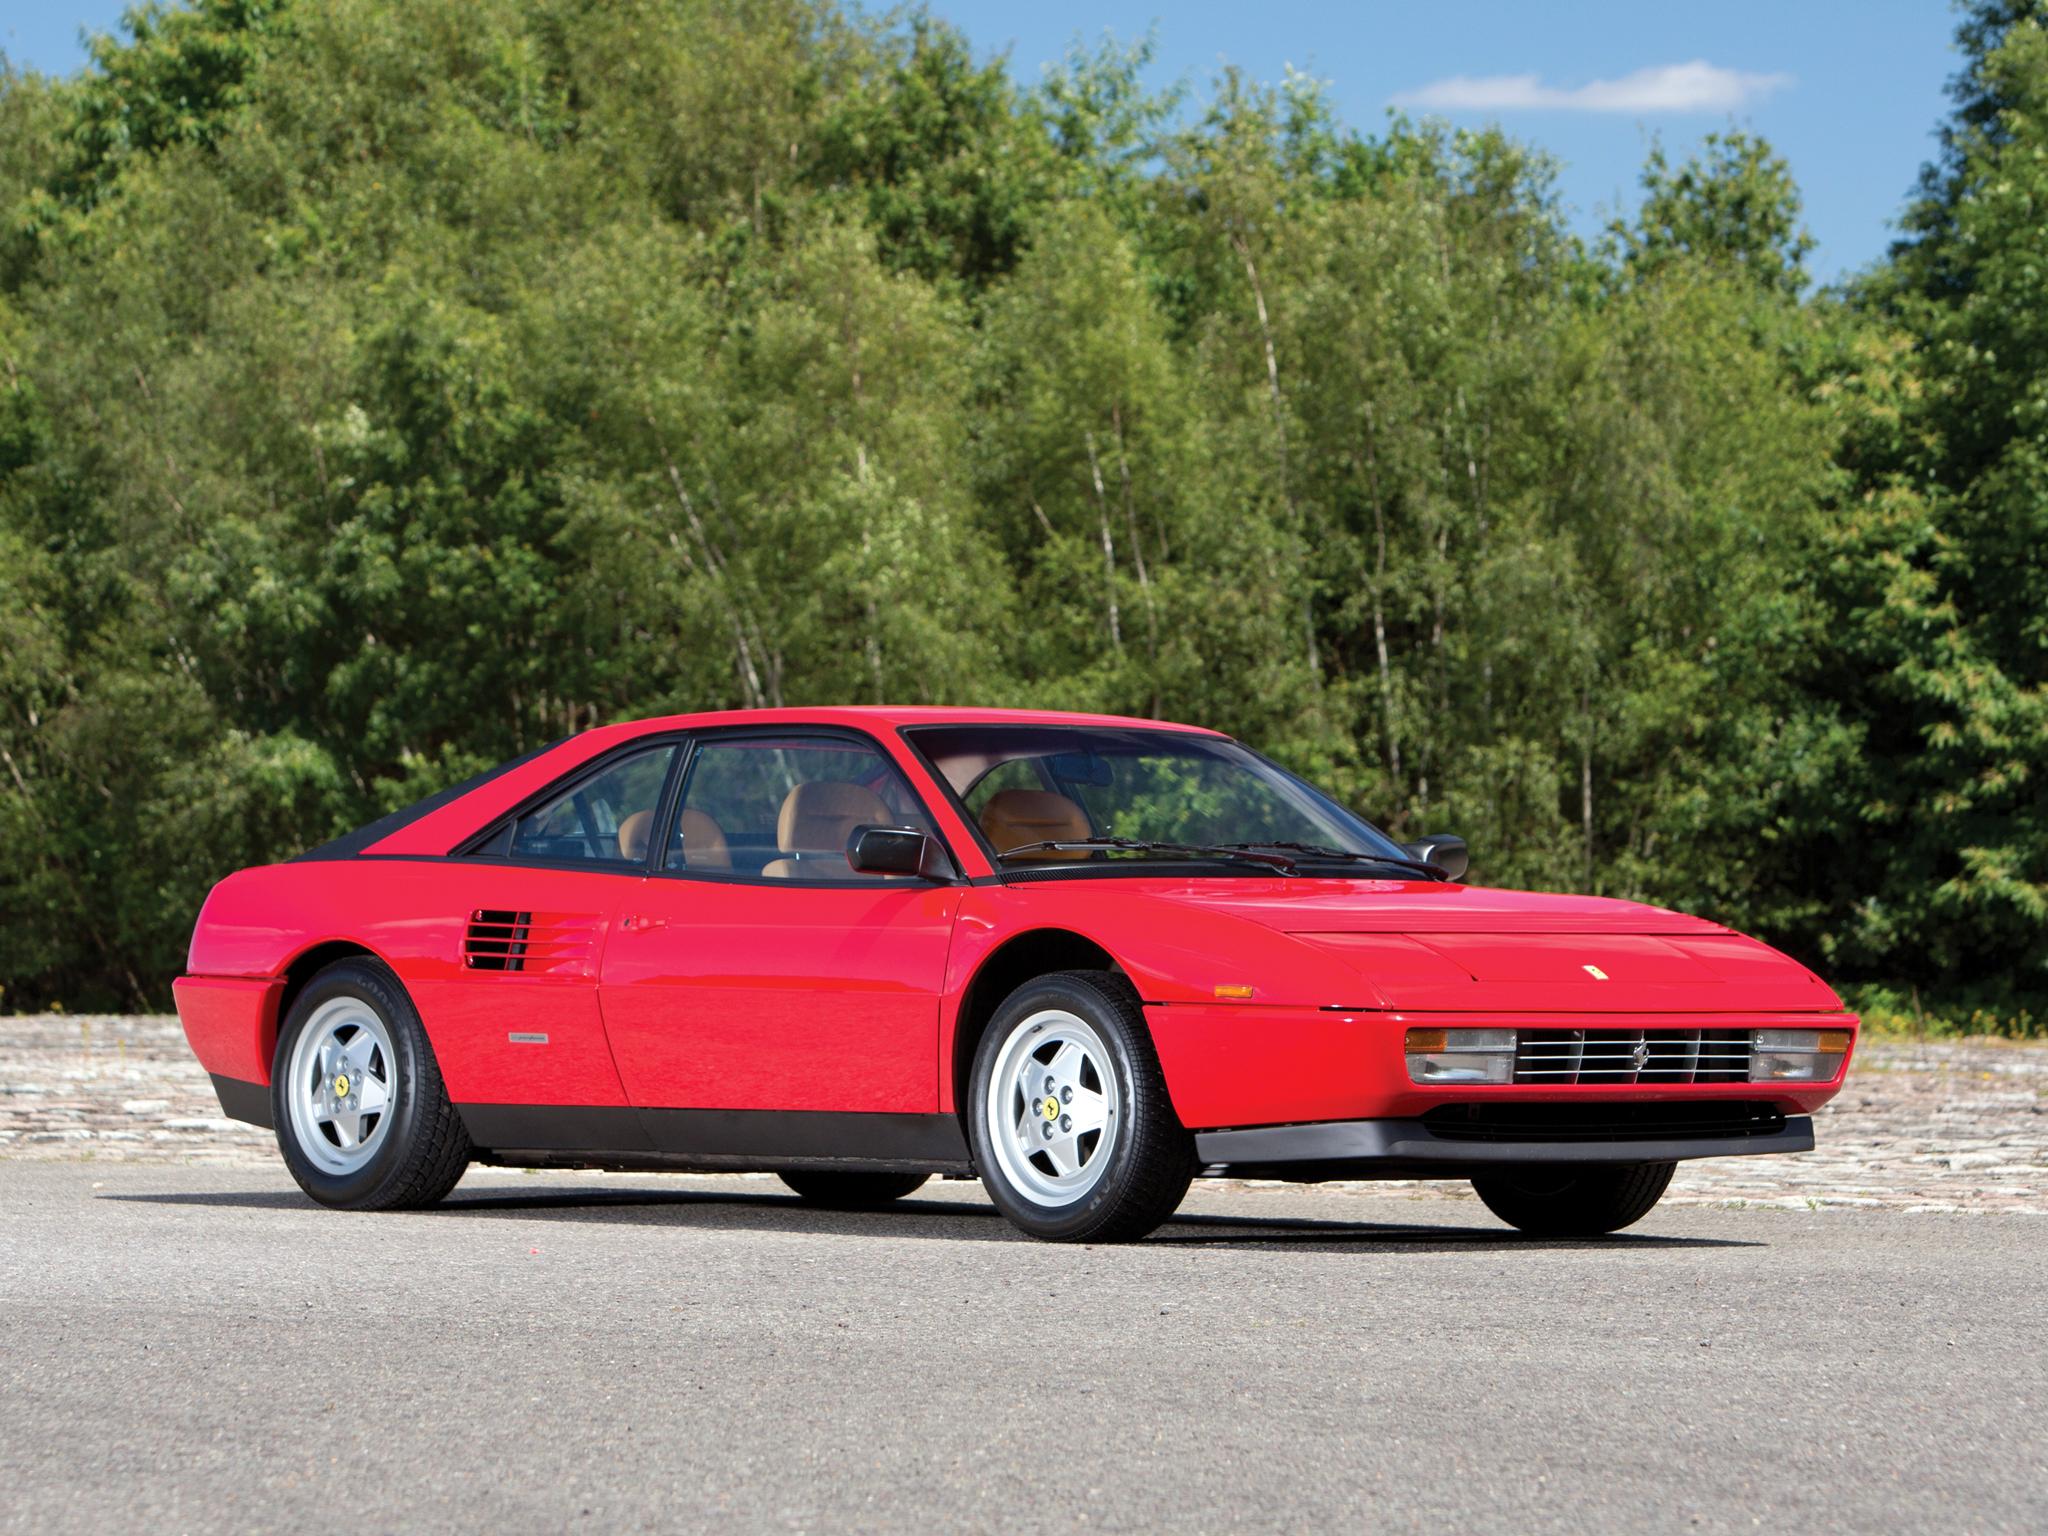 ferrari-mondial-t-3-4l-86592 Marvelous Photo Ferrari Mondial 8 Quattrovalvole Rouge Occasion Cars Trend